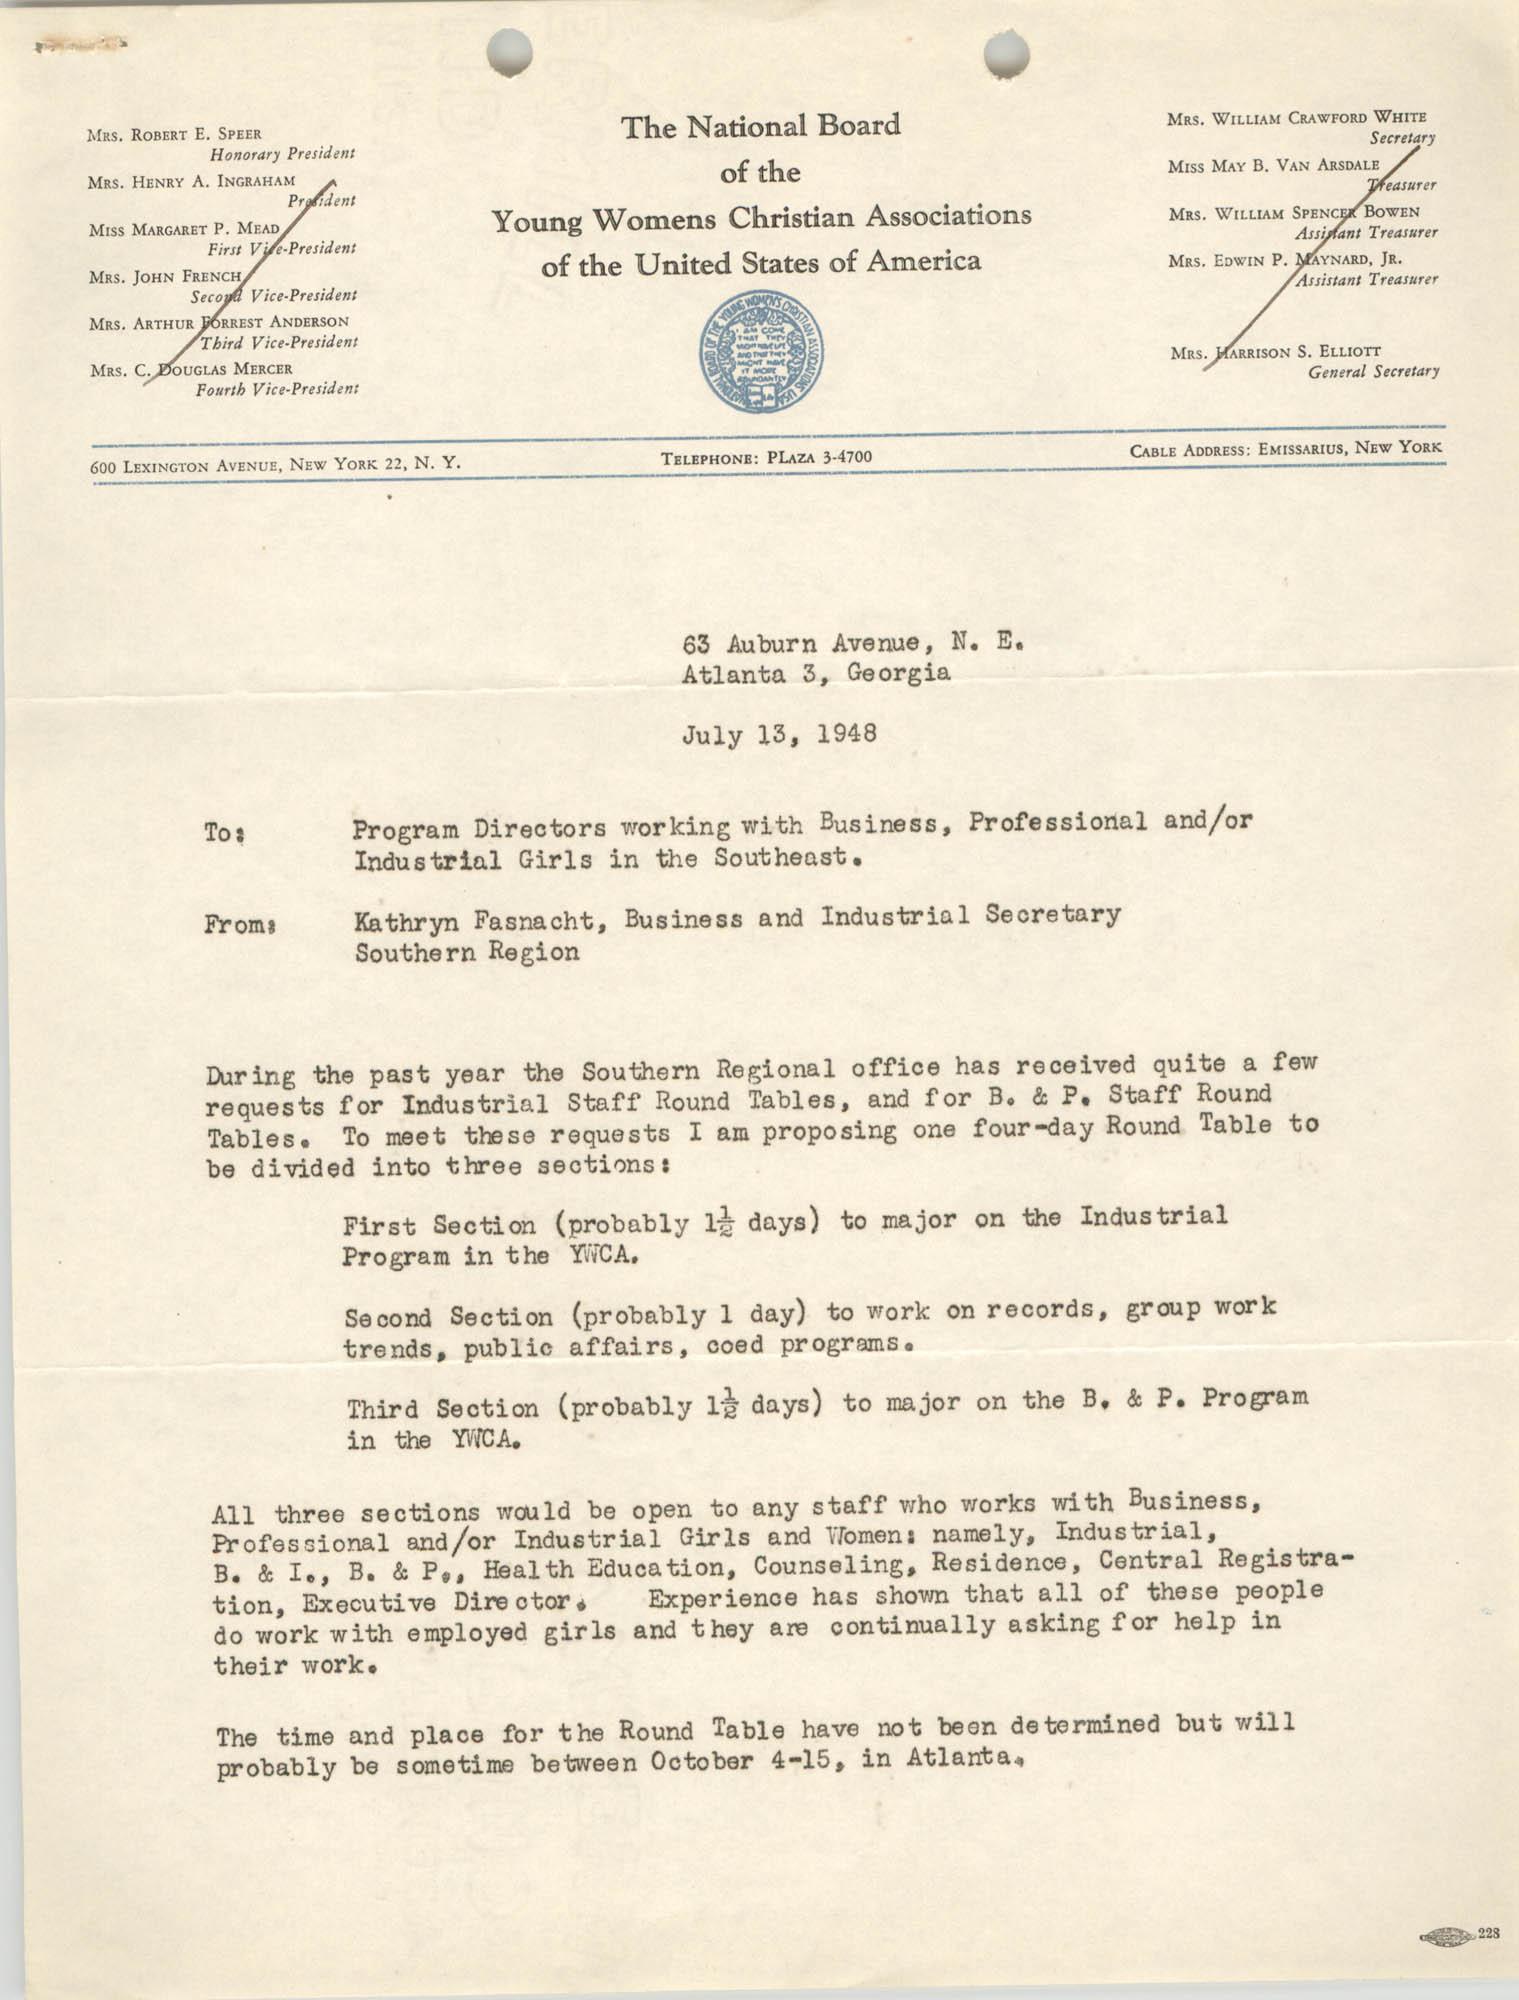 National Board of the Y.W.C.A. Memorandum, July 13, 1948, Part 1